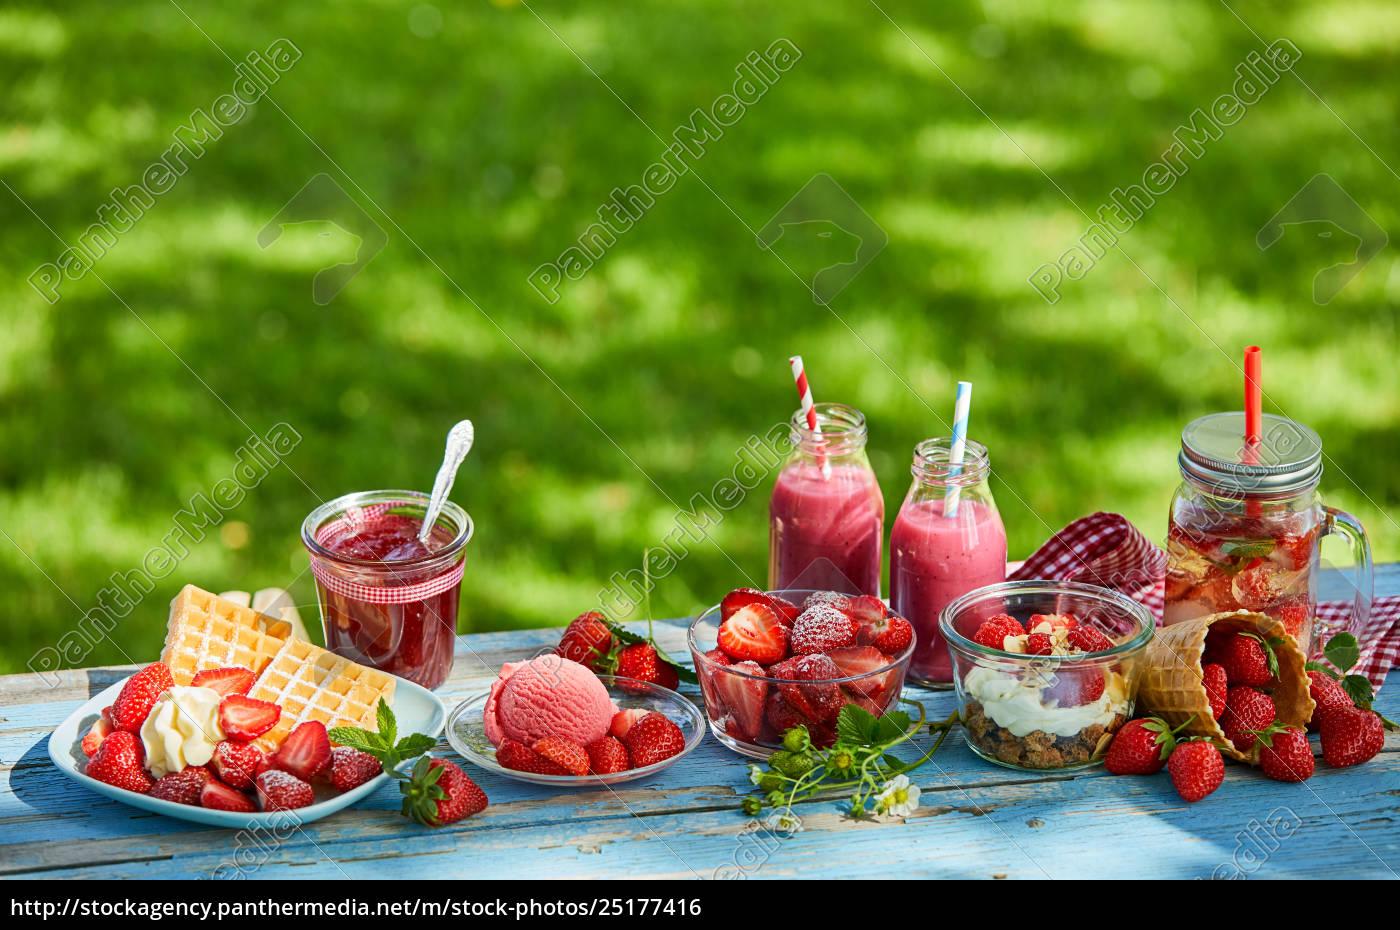 fresh, , vibrant, summer, strawberry, desserts, picnic - 25177416